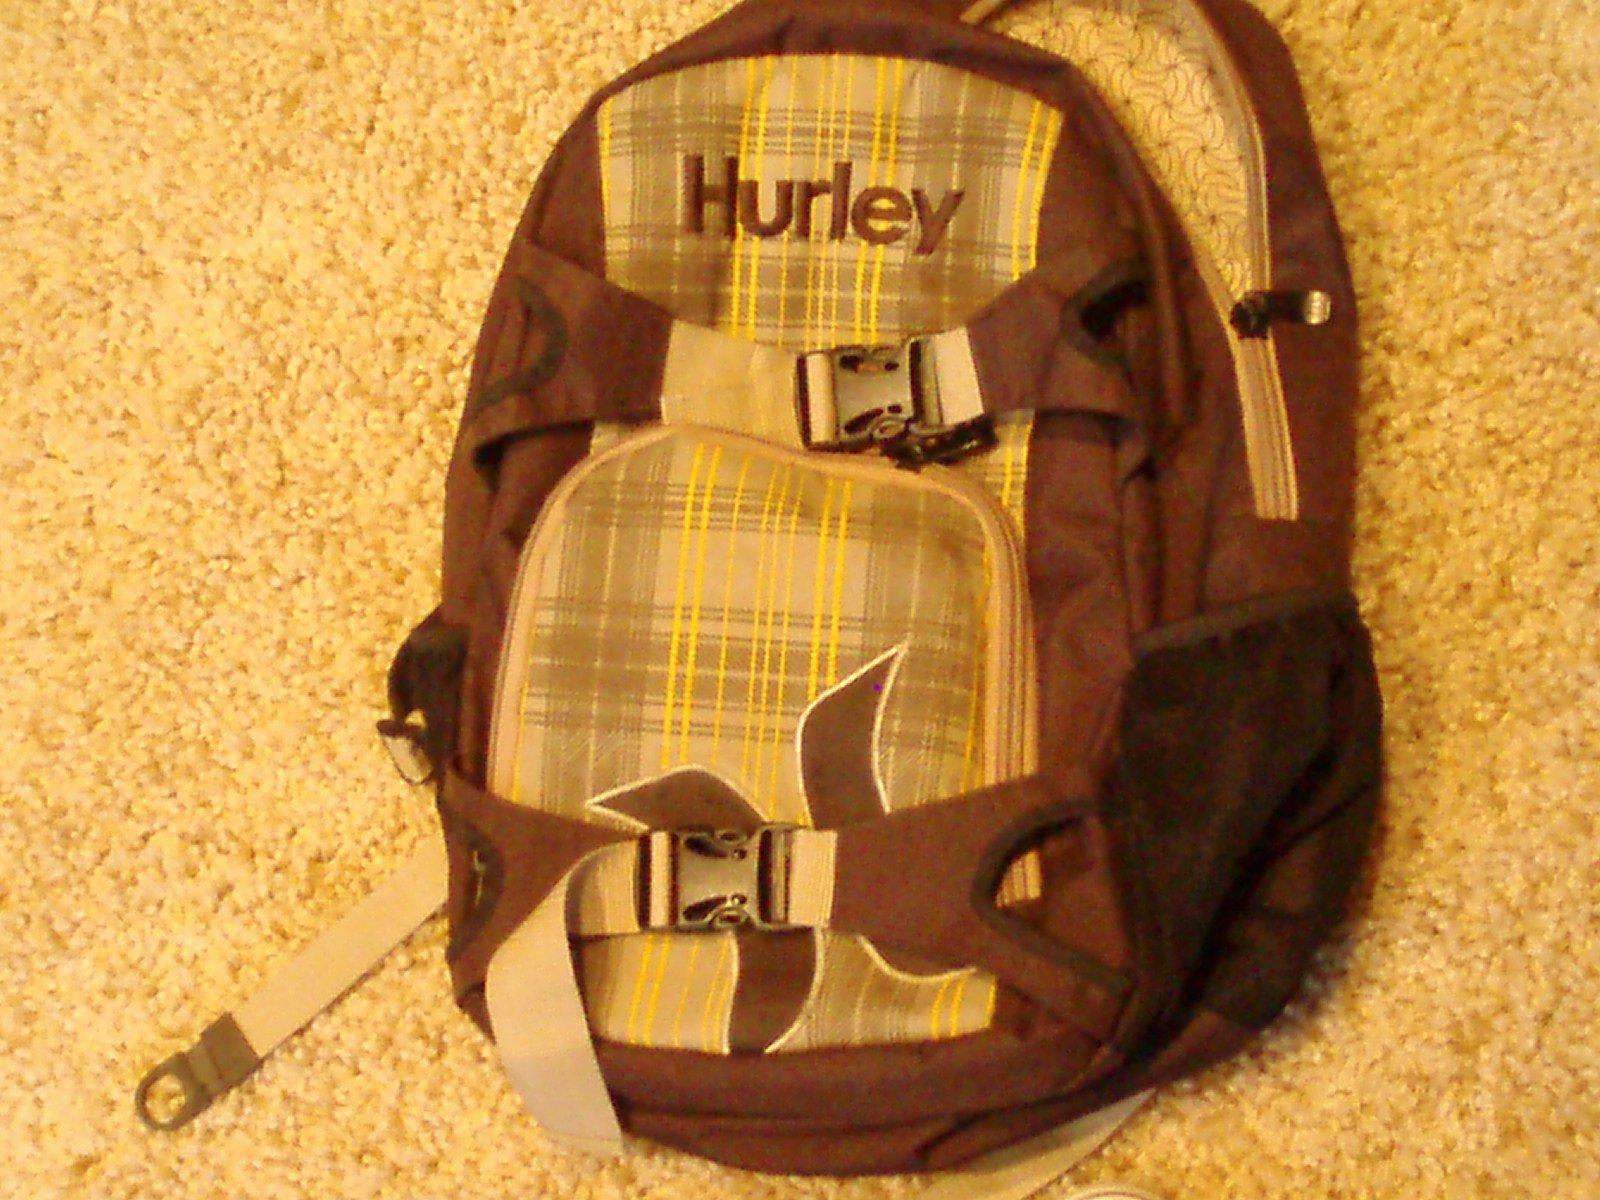 Hurley back pack